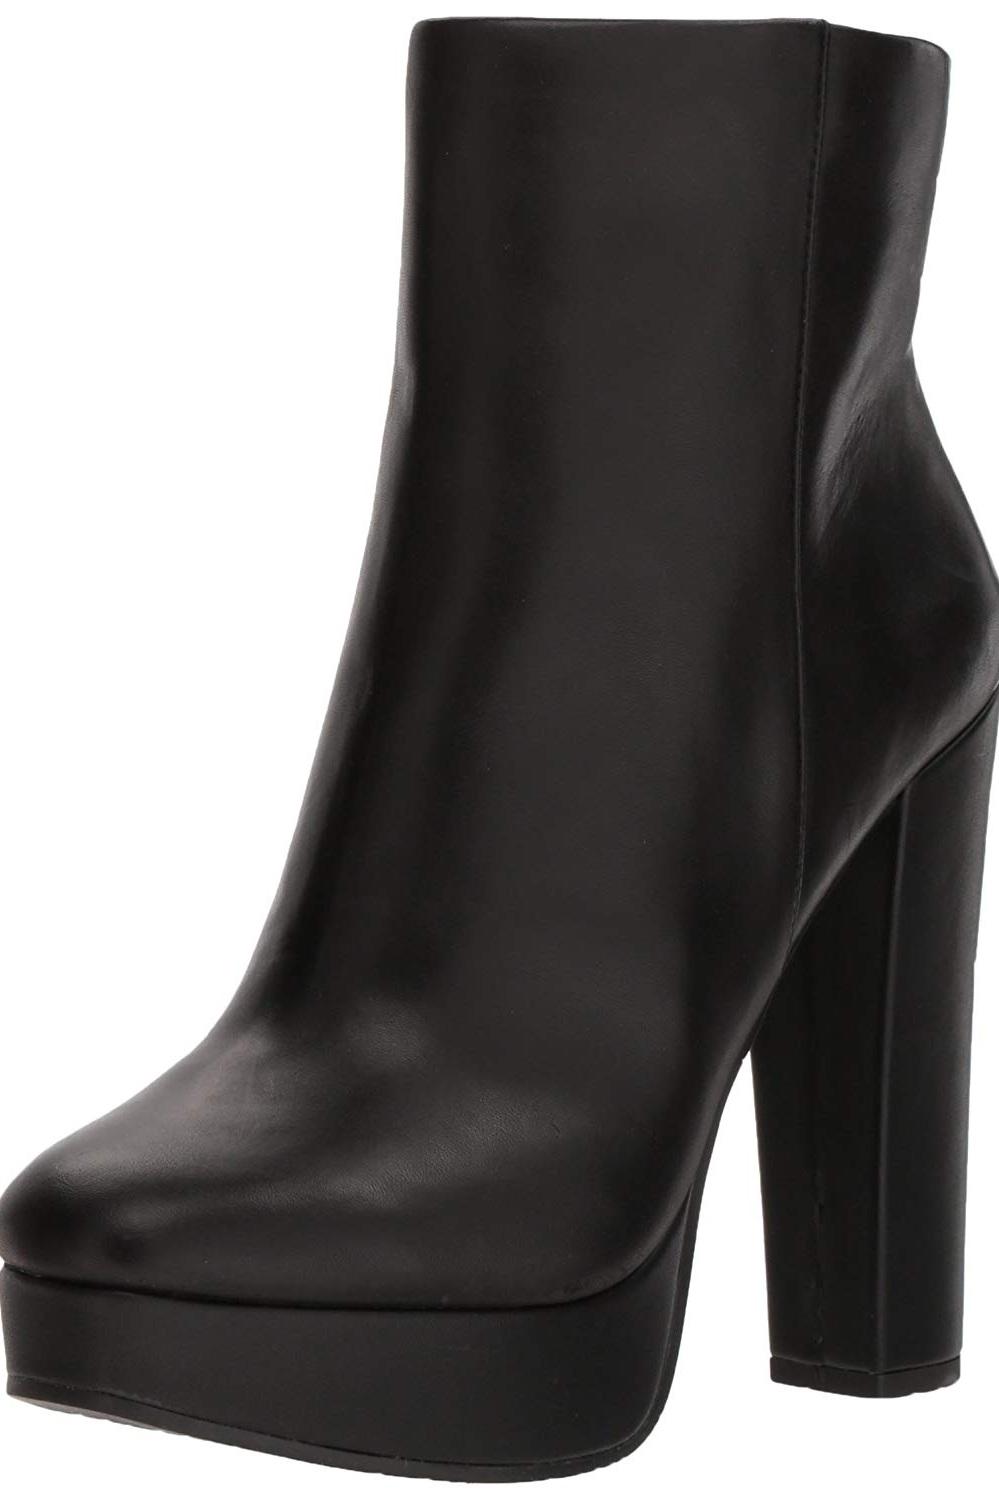 Sebille Fashion Boot, $100, Amazon